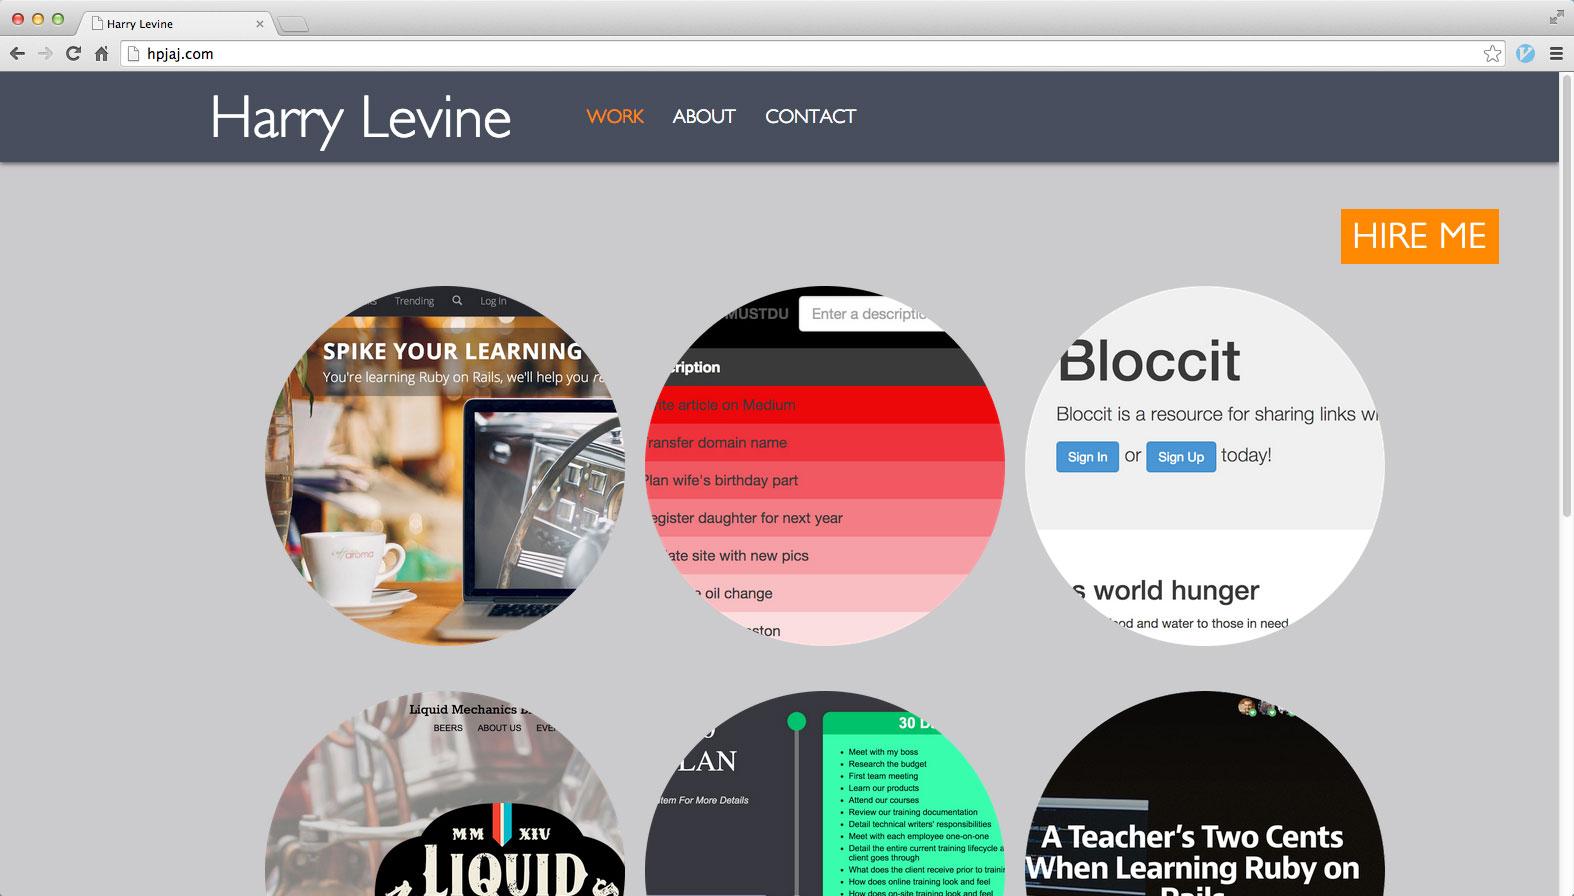 d067d8cca online-portfolio/README.md at master · hpjaj/online-portfolio · GitHub